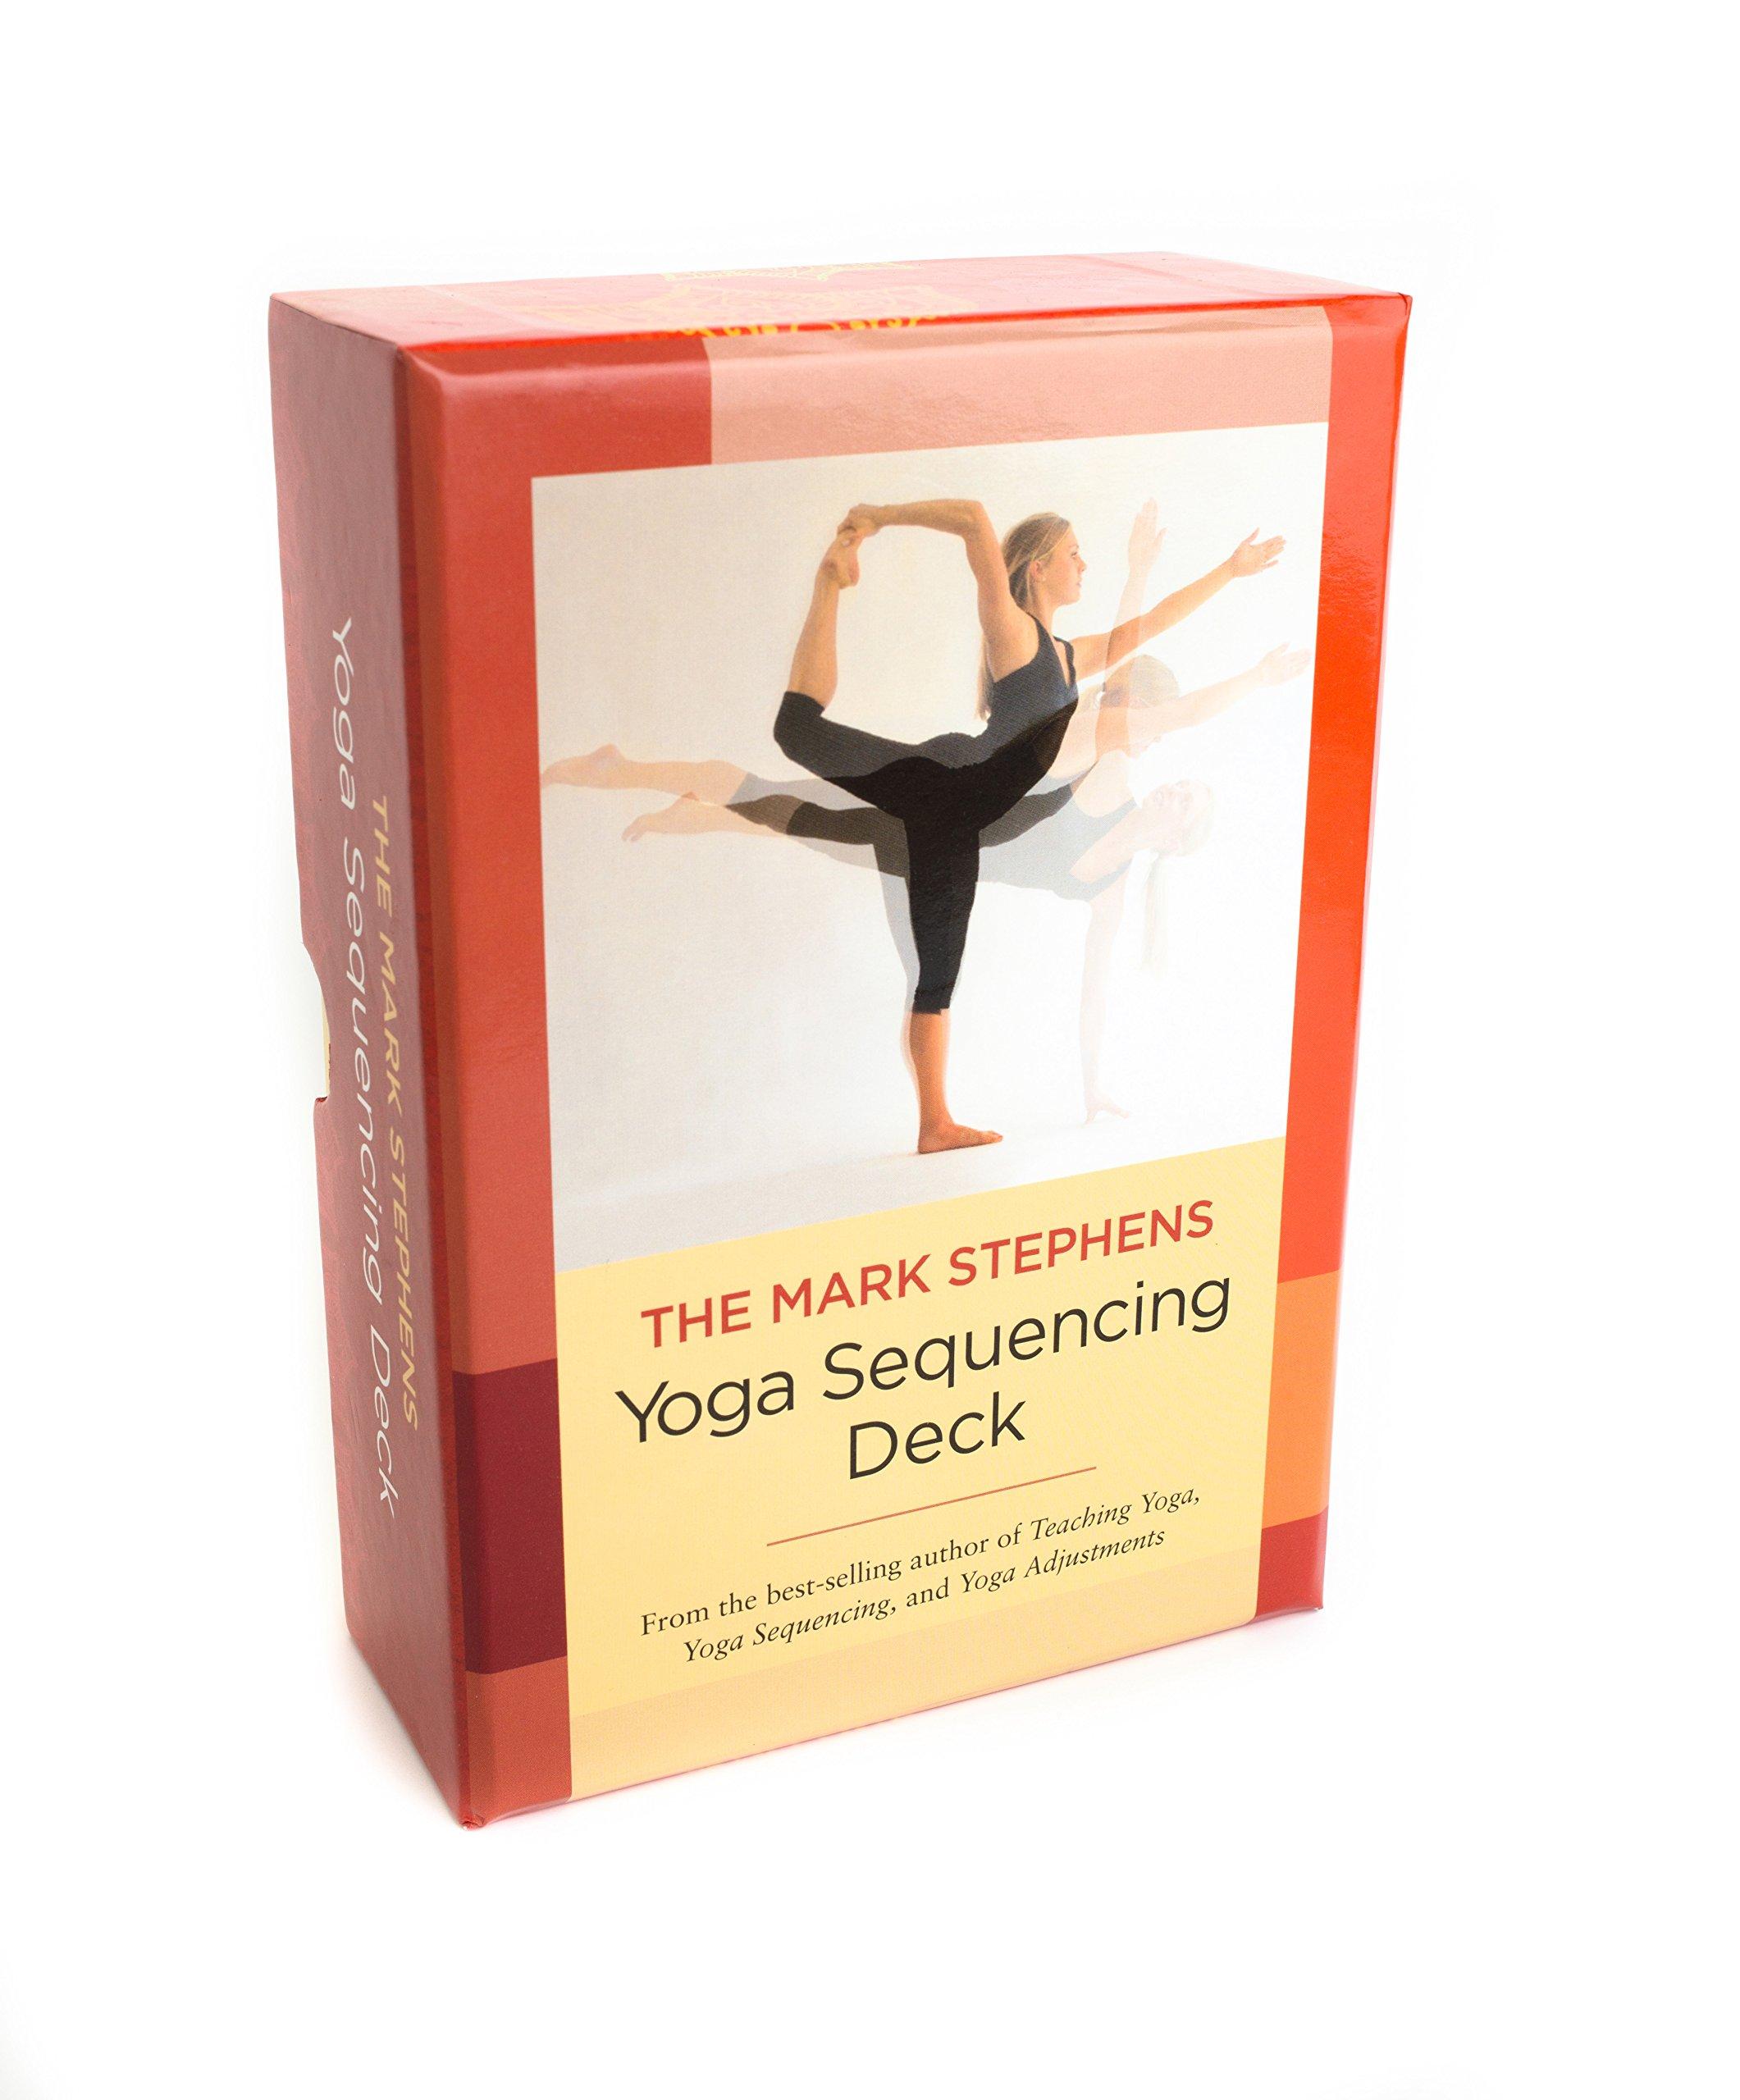 The Mark Stephens Yoga Sequencing Deck: Amazon.es: Mark ...